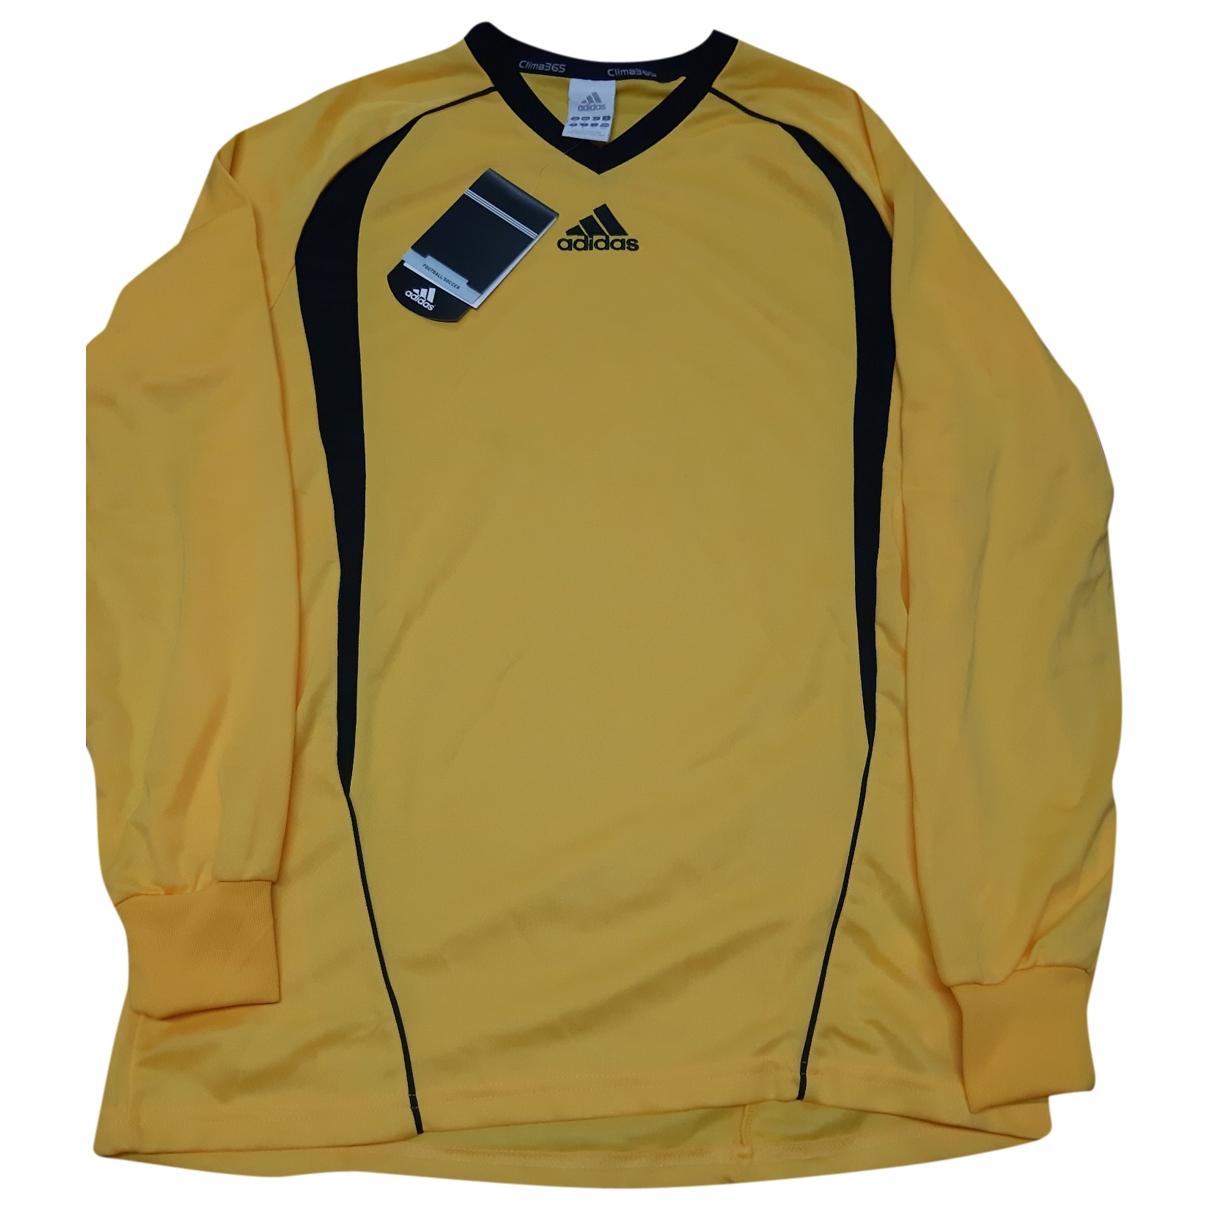 Adidas - Tee shirts   pour homme - jaune